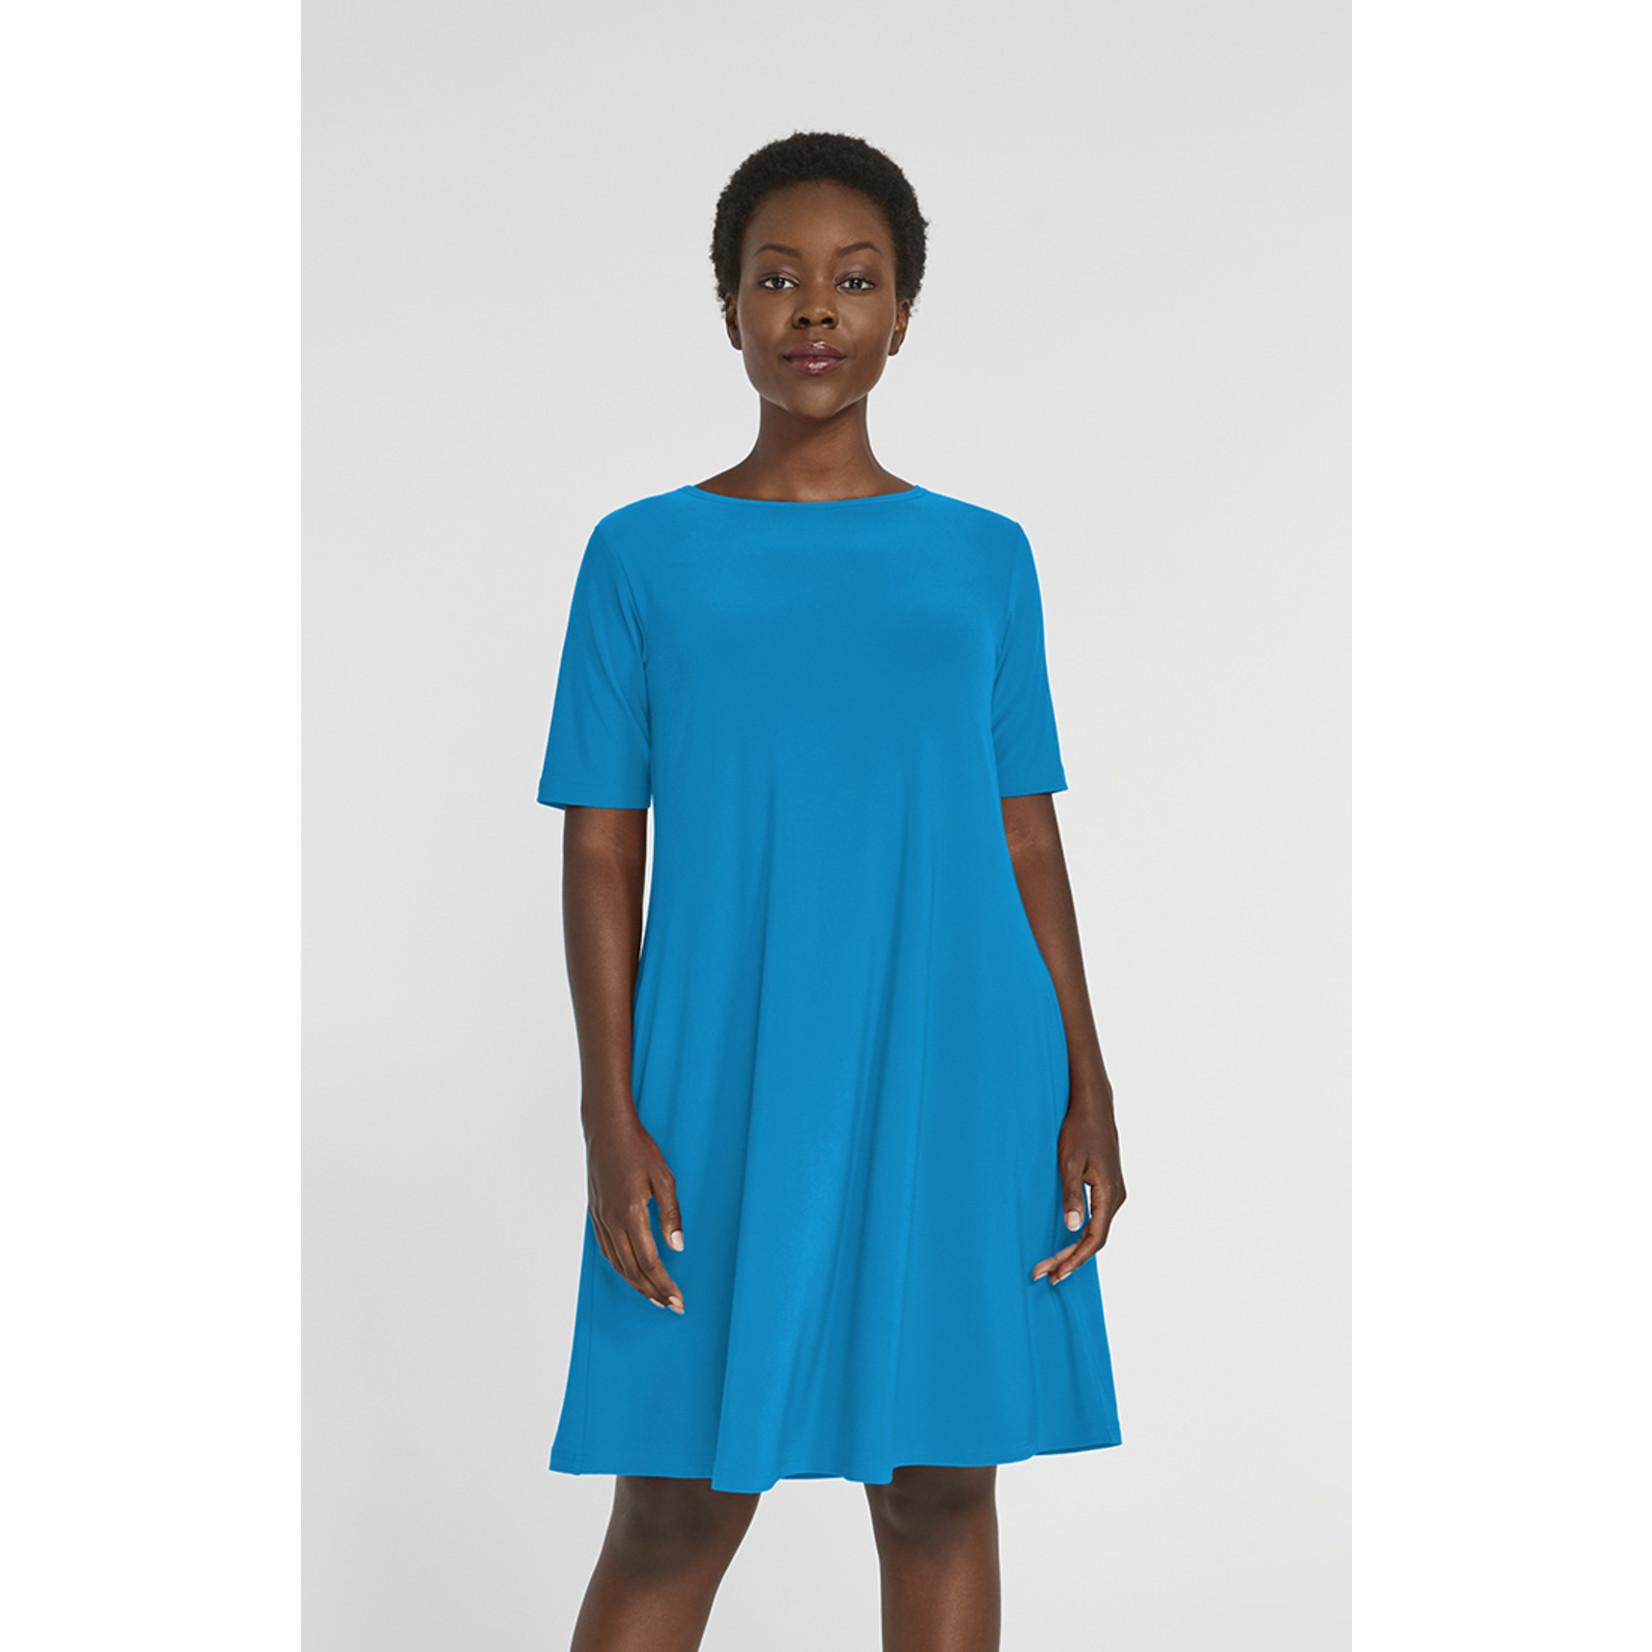 Sympli Sympli Trapeze Dress - Short